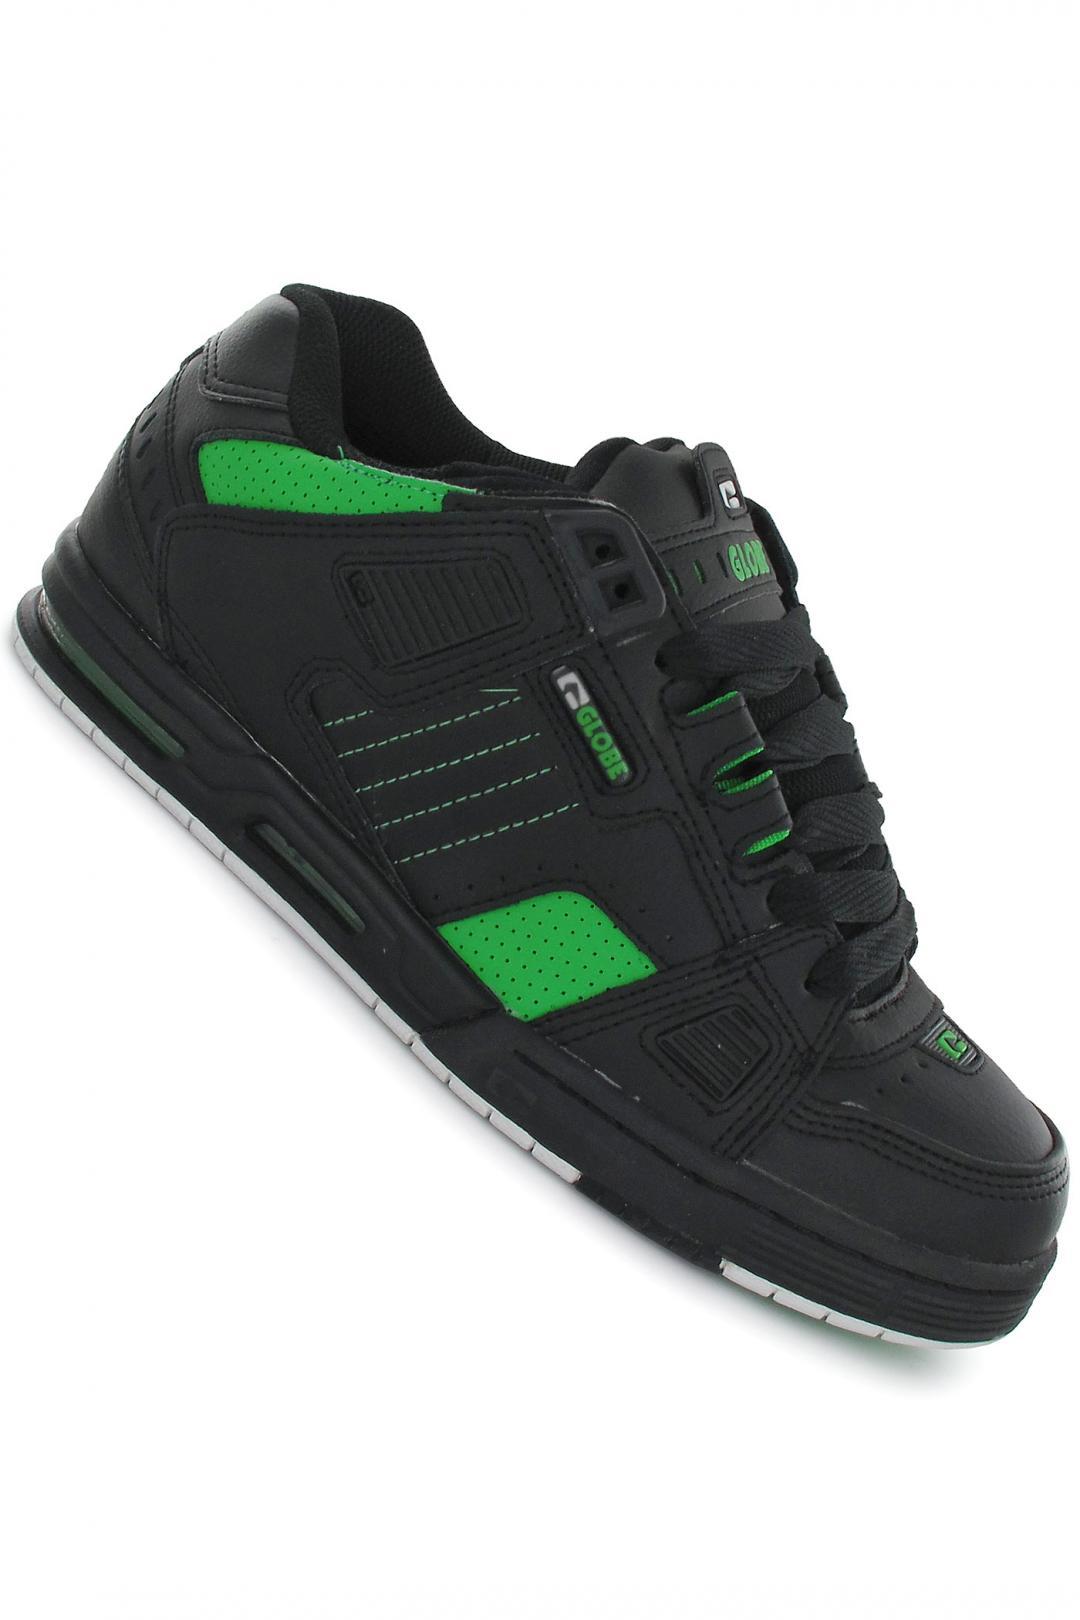 Uomo Globe Sabre black moto green | Sneakers low top